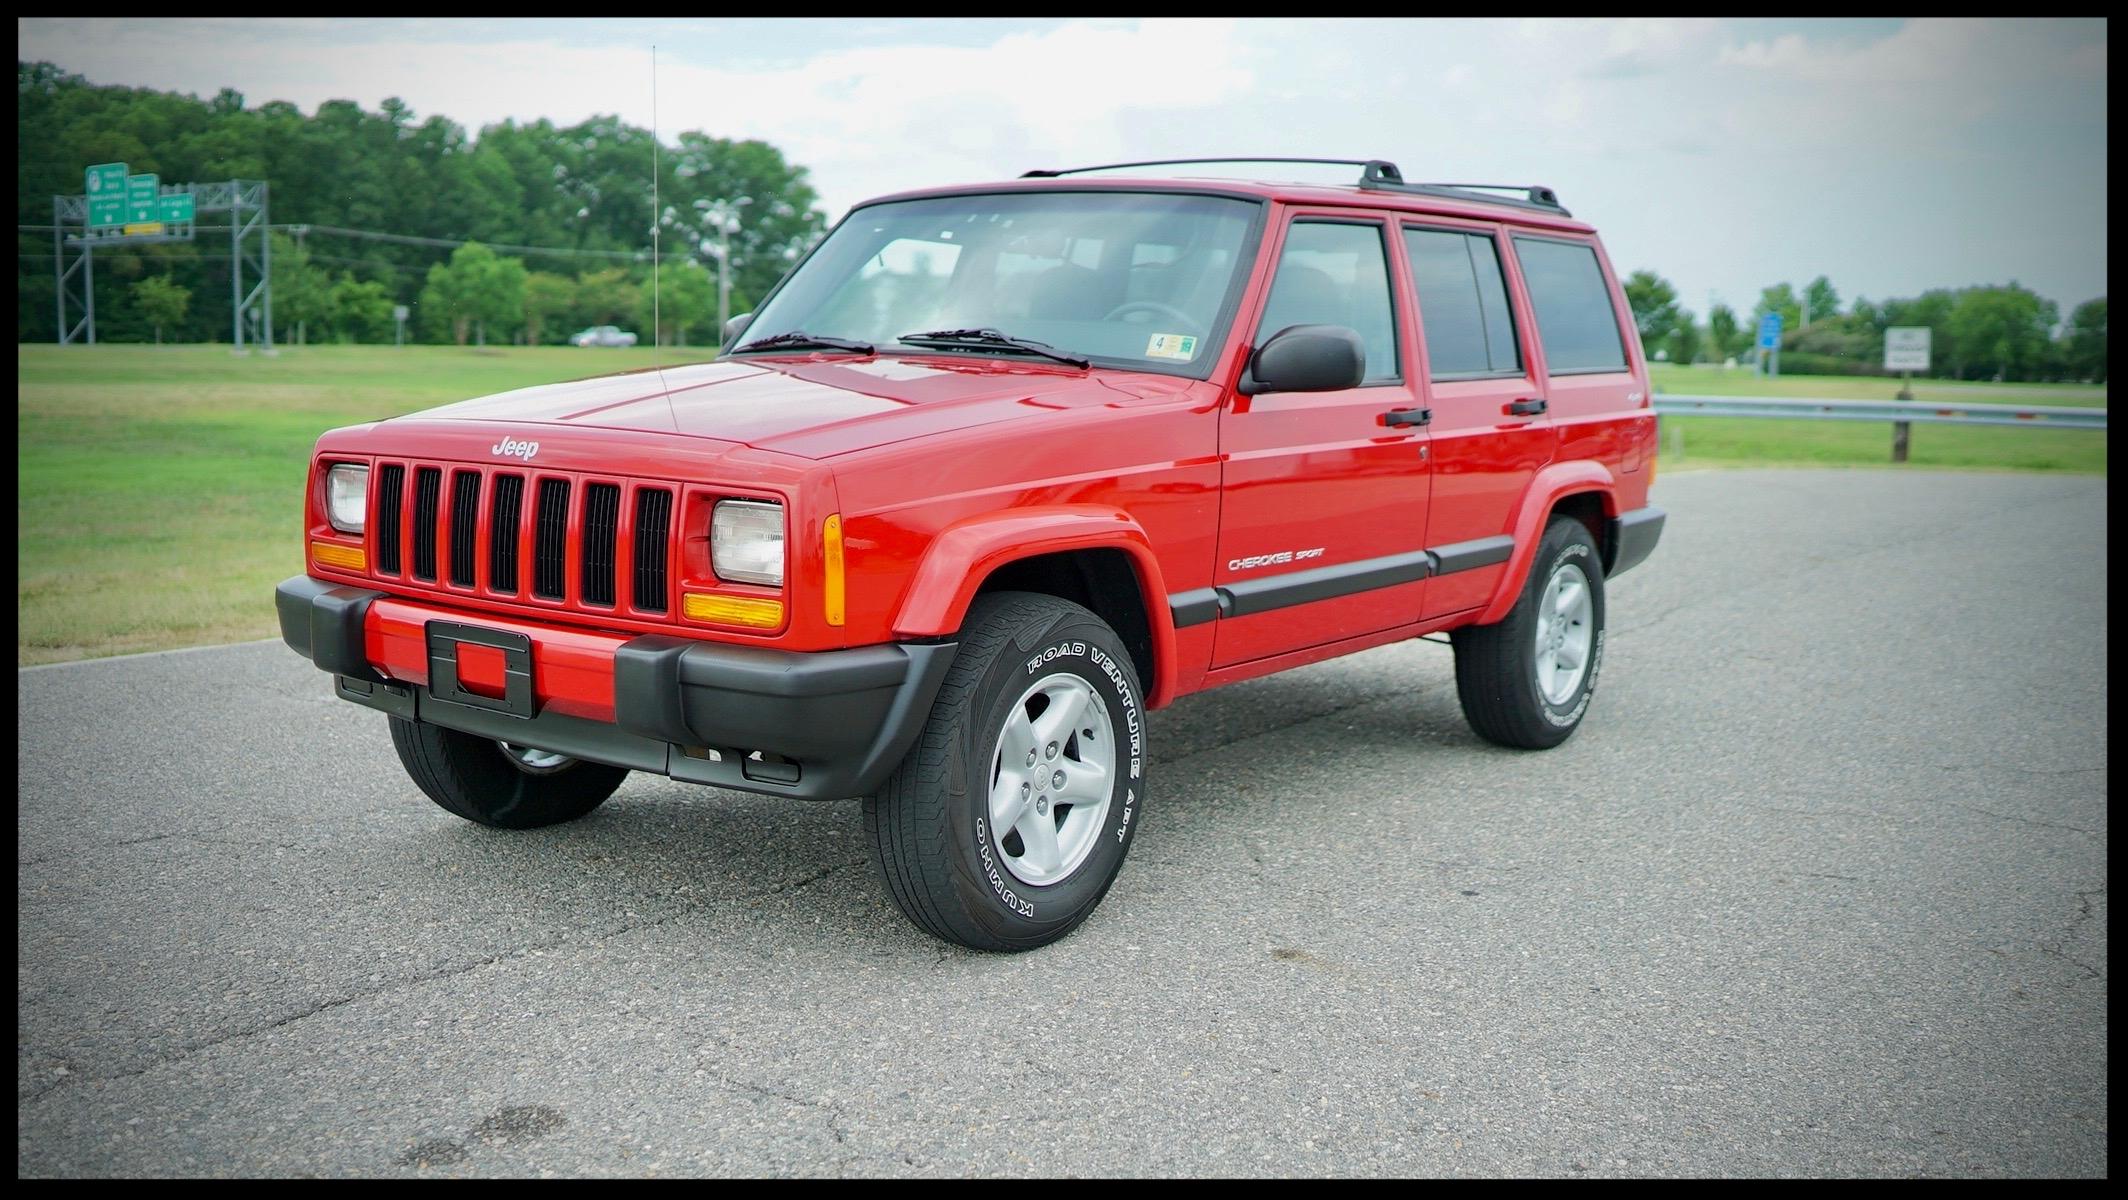 Jeep Cherokee Sport For Sale >> Jeep Cherokee Xj Sport For Sale Low Mileage Original Cherokee Xj